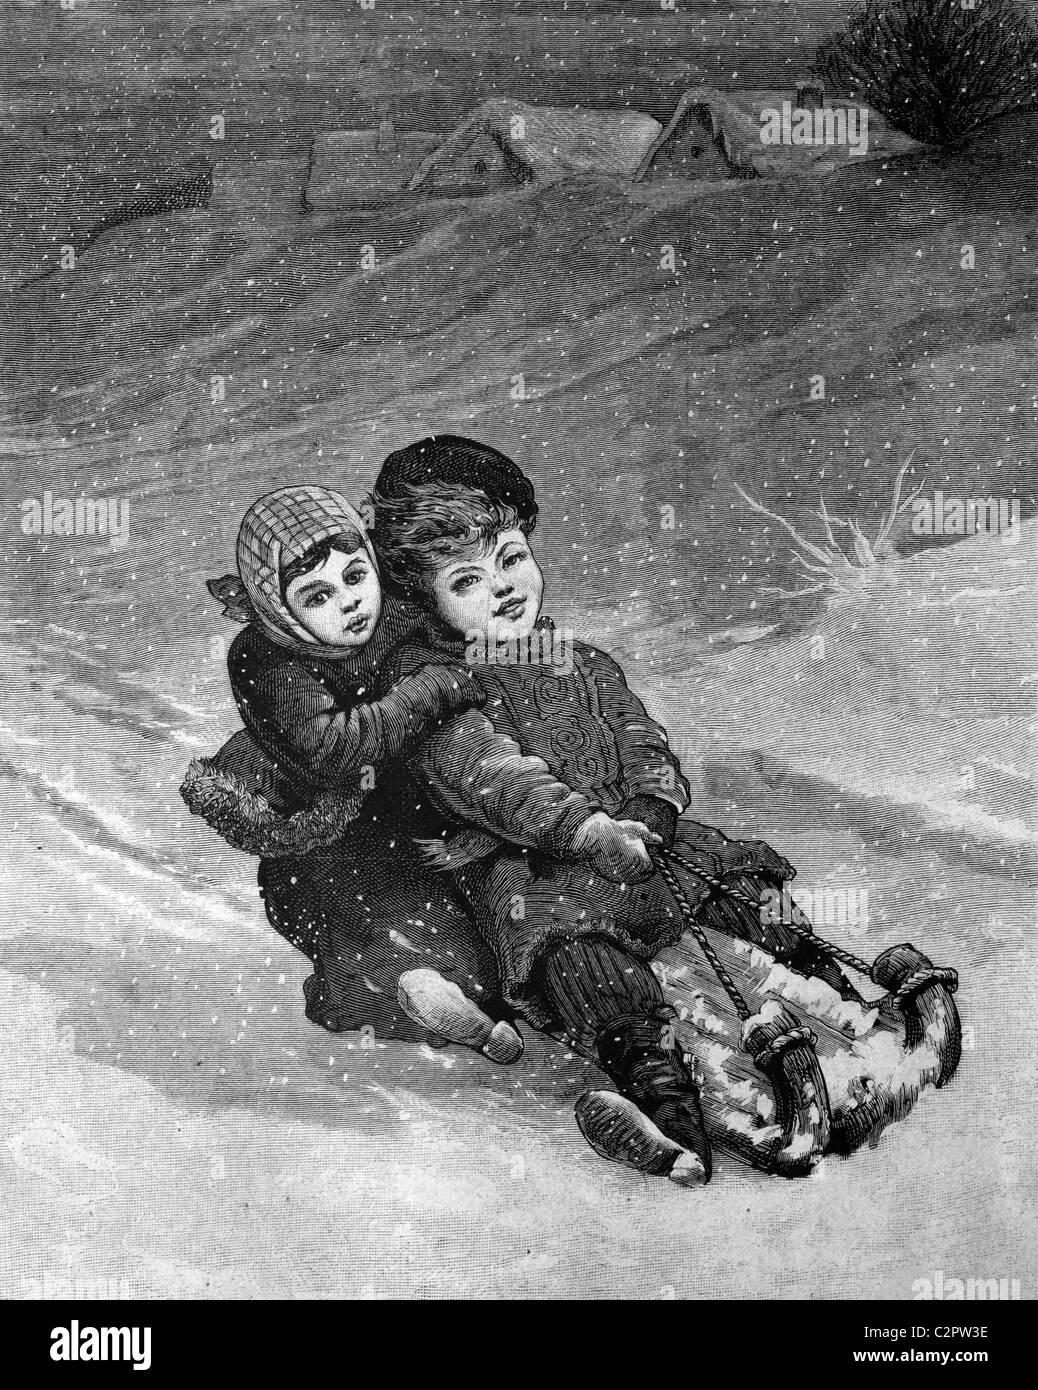 Kinder Rodeln, historische Illustration über 1886 Stockbild